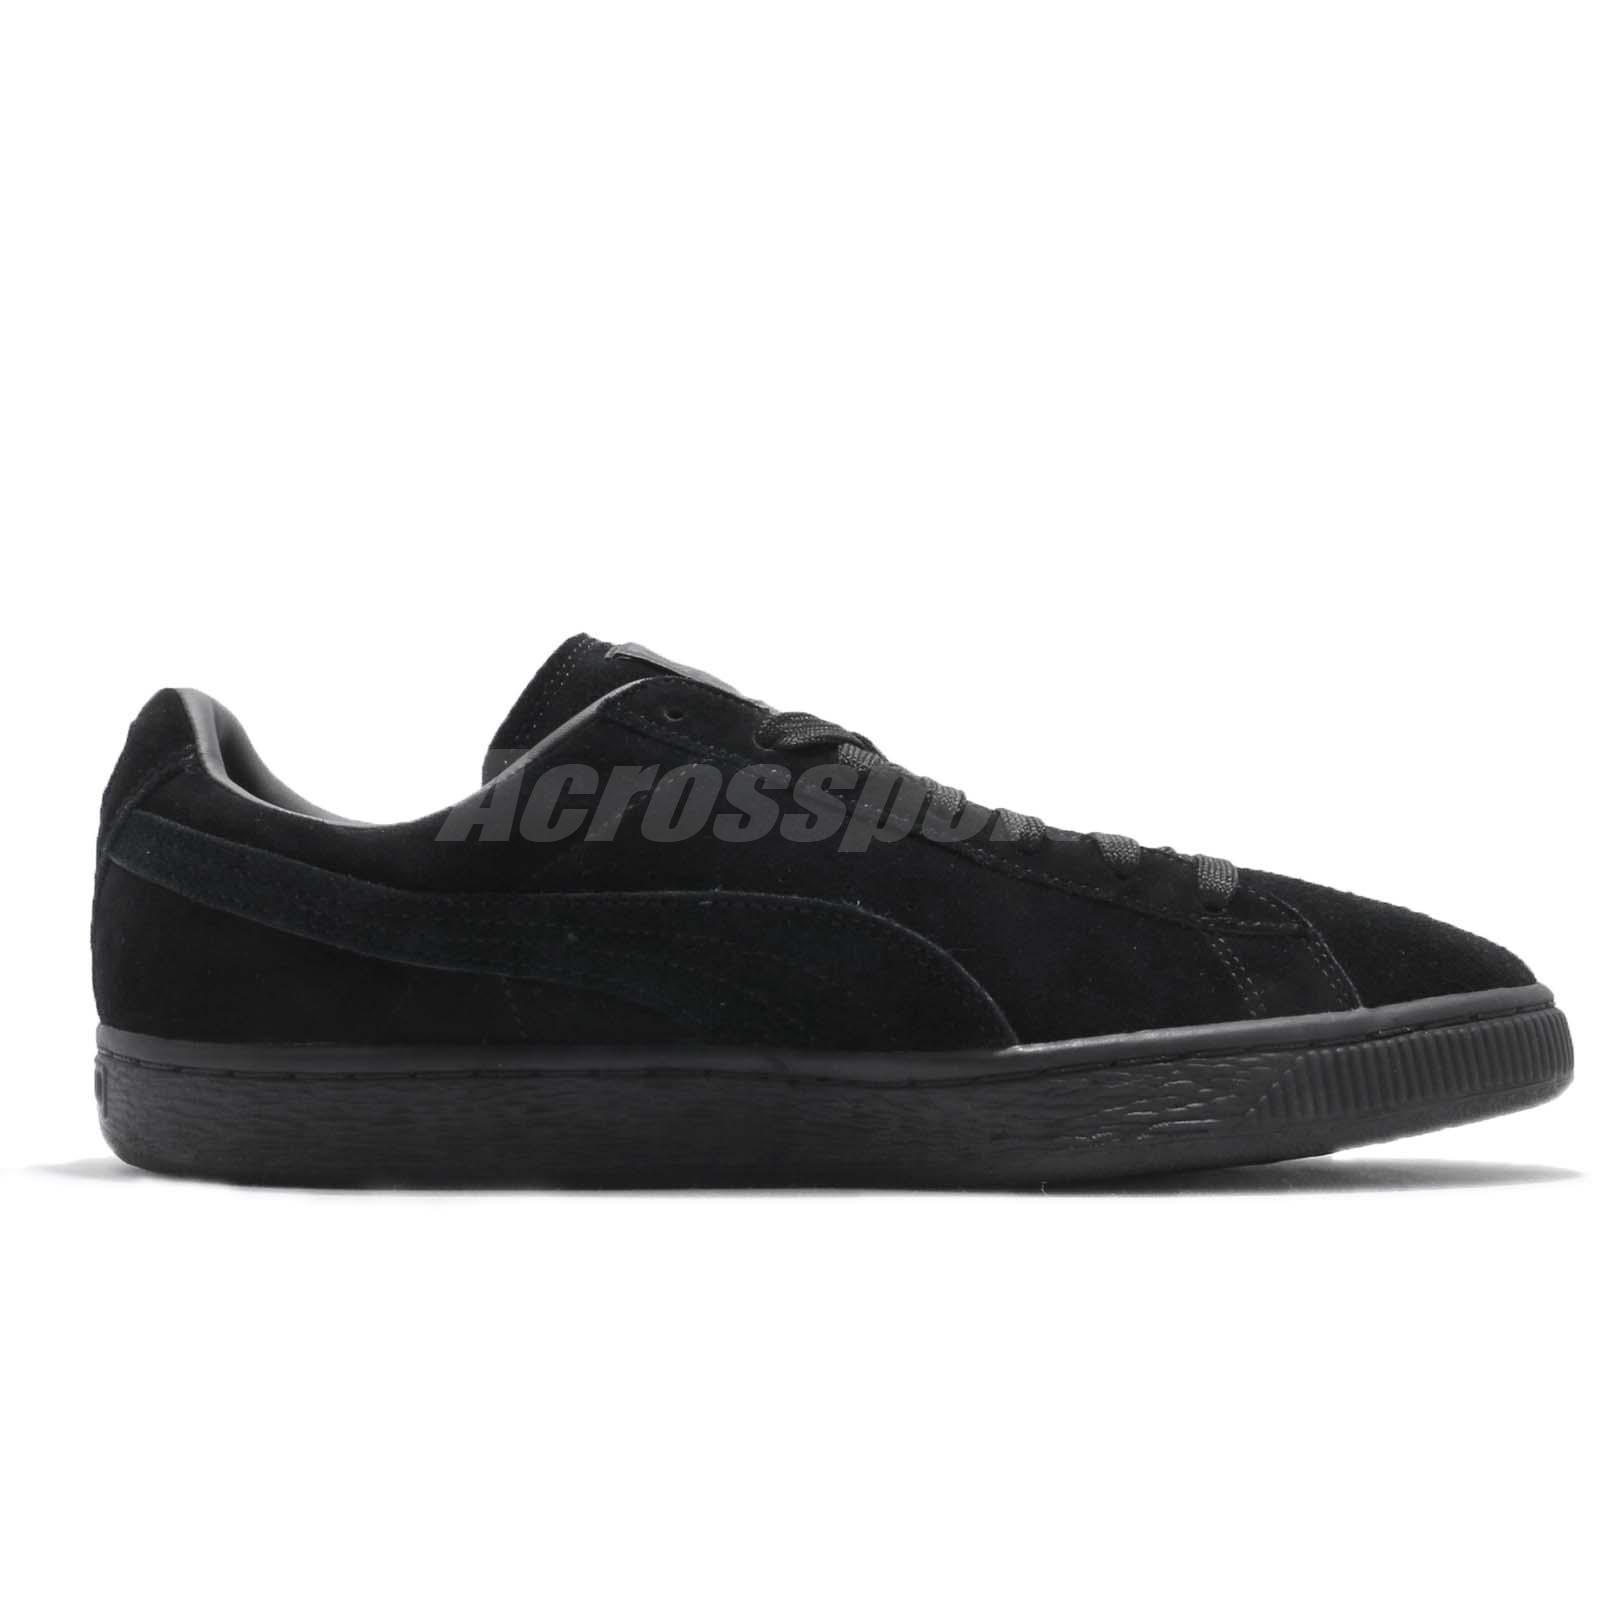 5dcdb82120357 Puma Suede Classic Black Dark Shadow Men Casual Shoes Sneakers ...